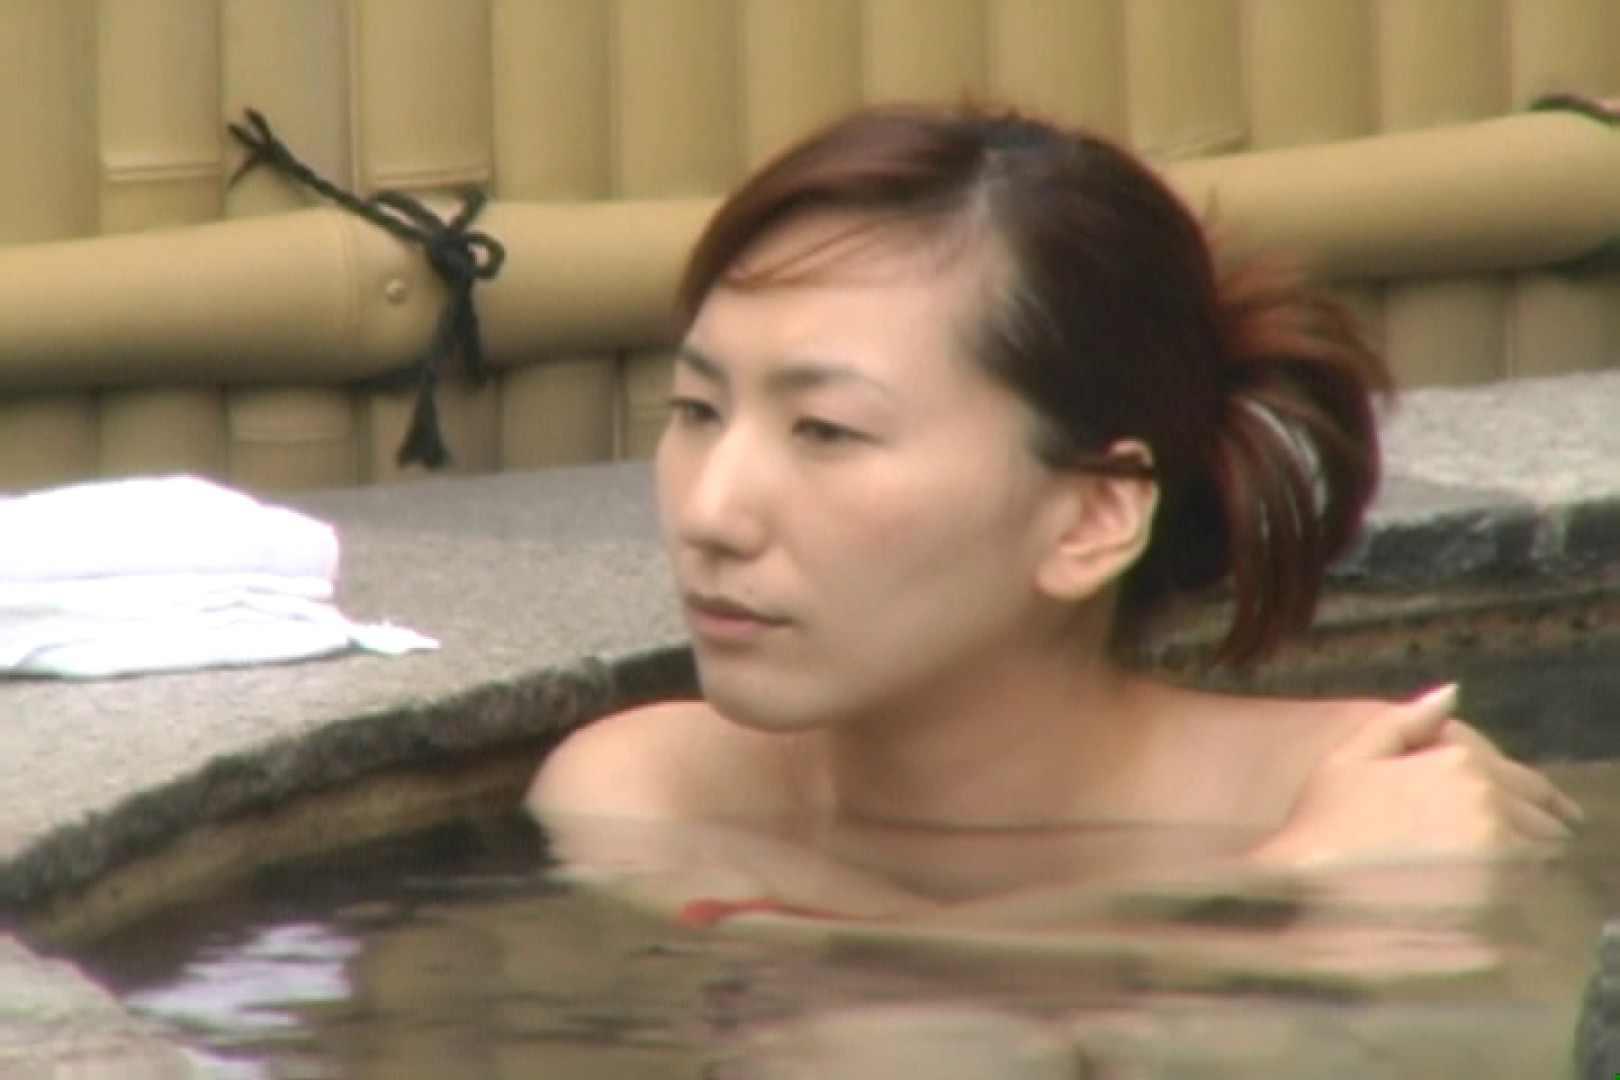 Aquaな露天風呂Vol.616 露天風呂編  89PIX 58